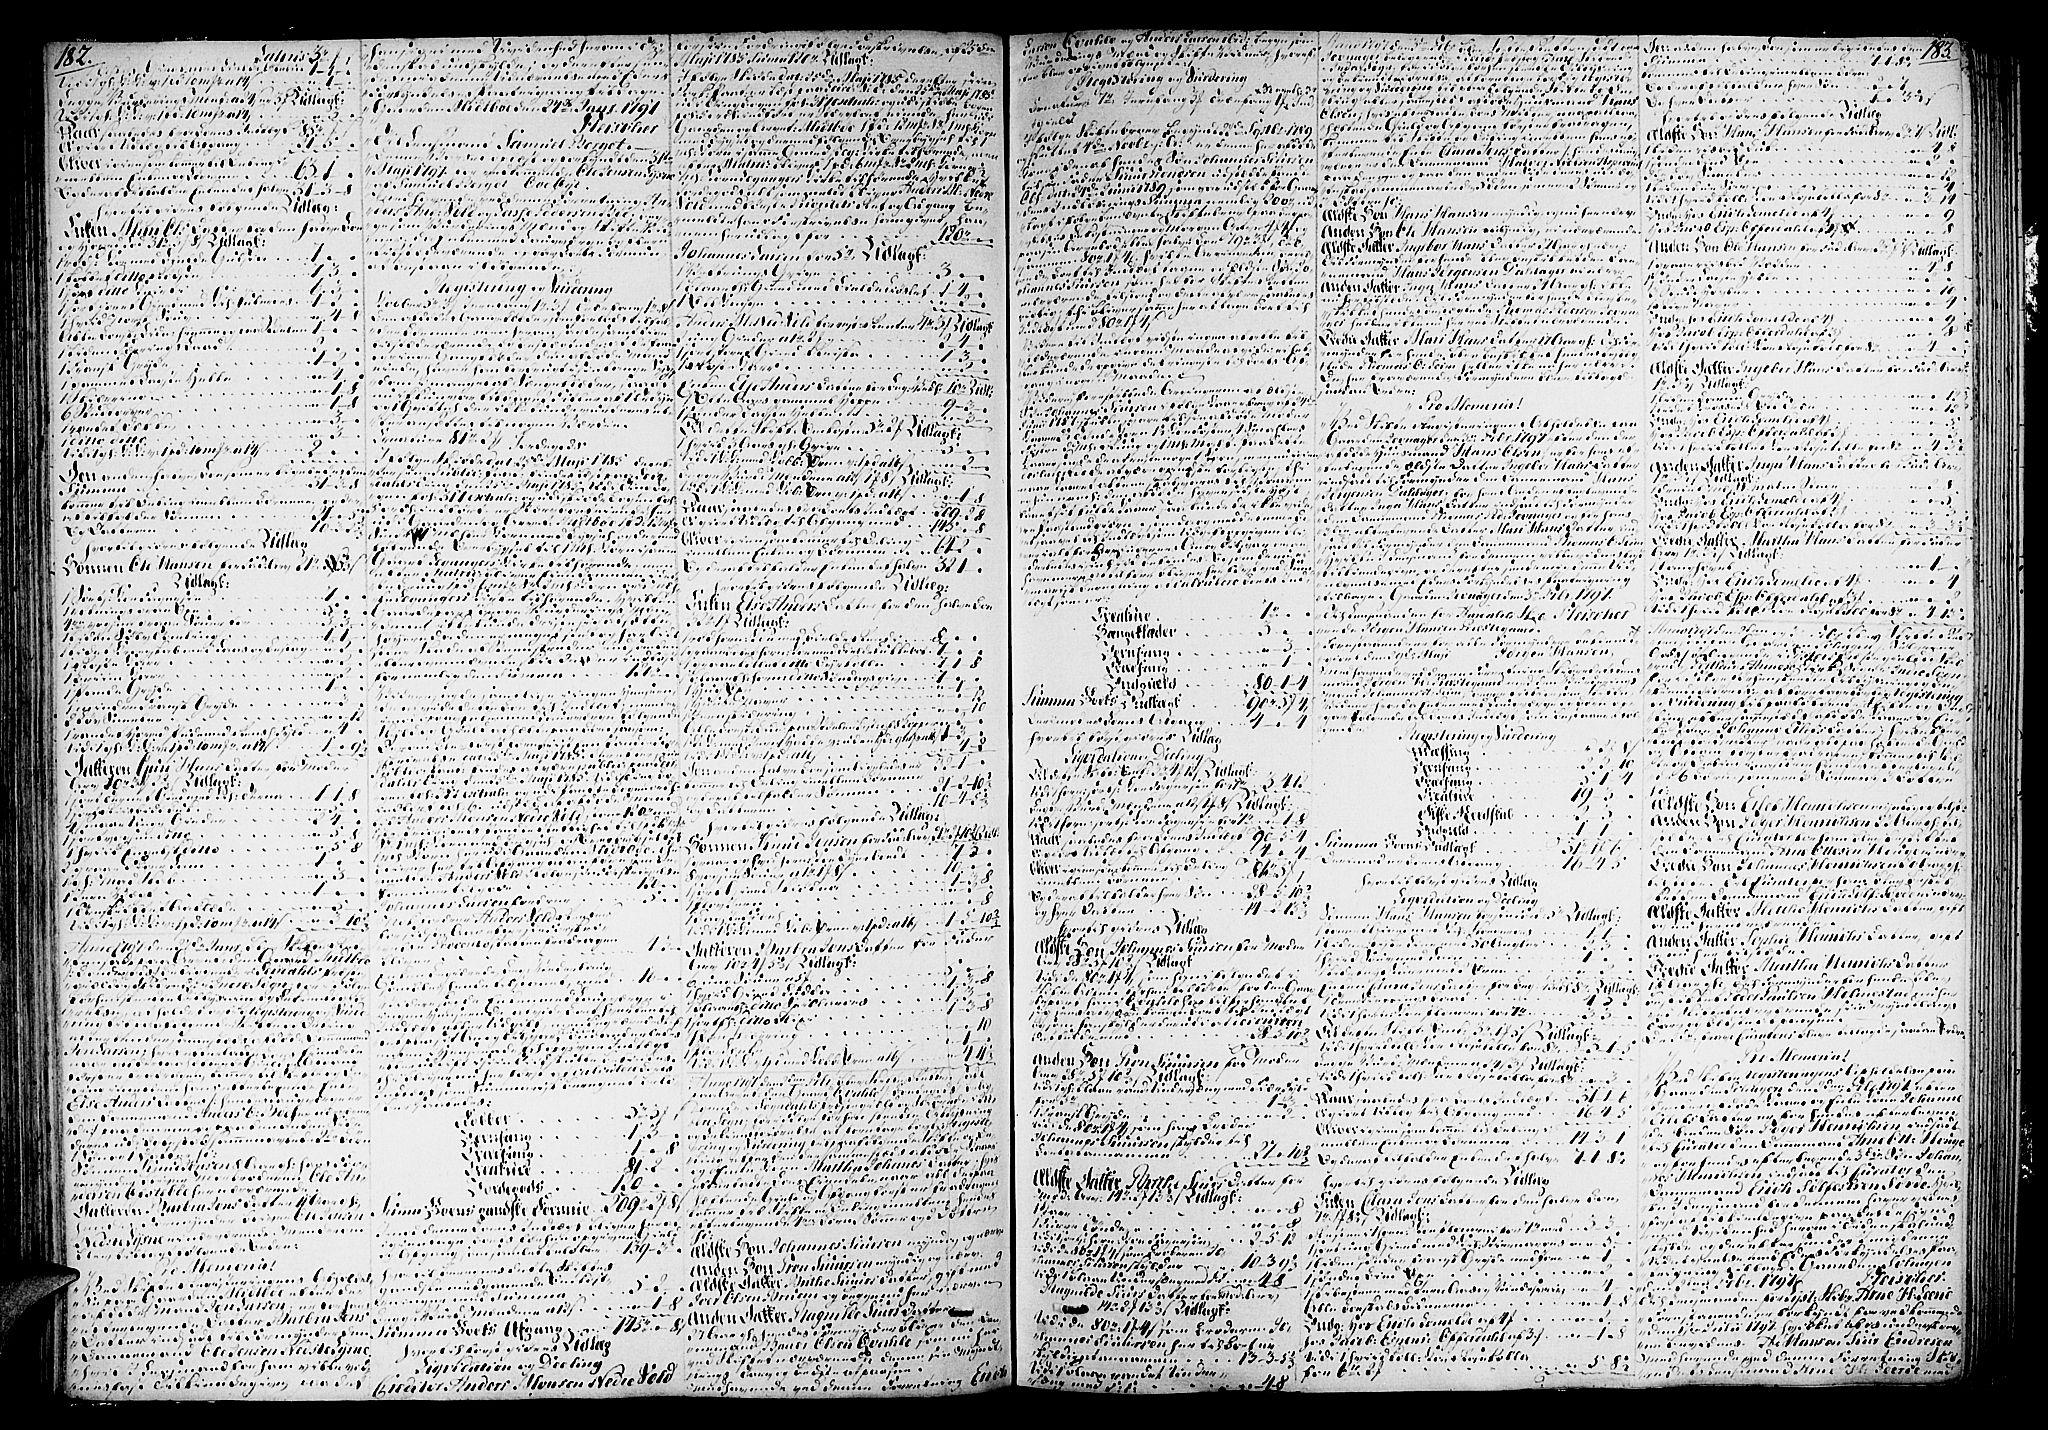 SAB, Indre Sogn sorenskriveri, H/Ha/L0011a: Skifteprotokoll 11a, 1795-1800, s. 182-183